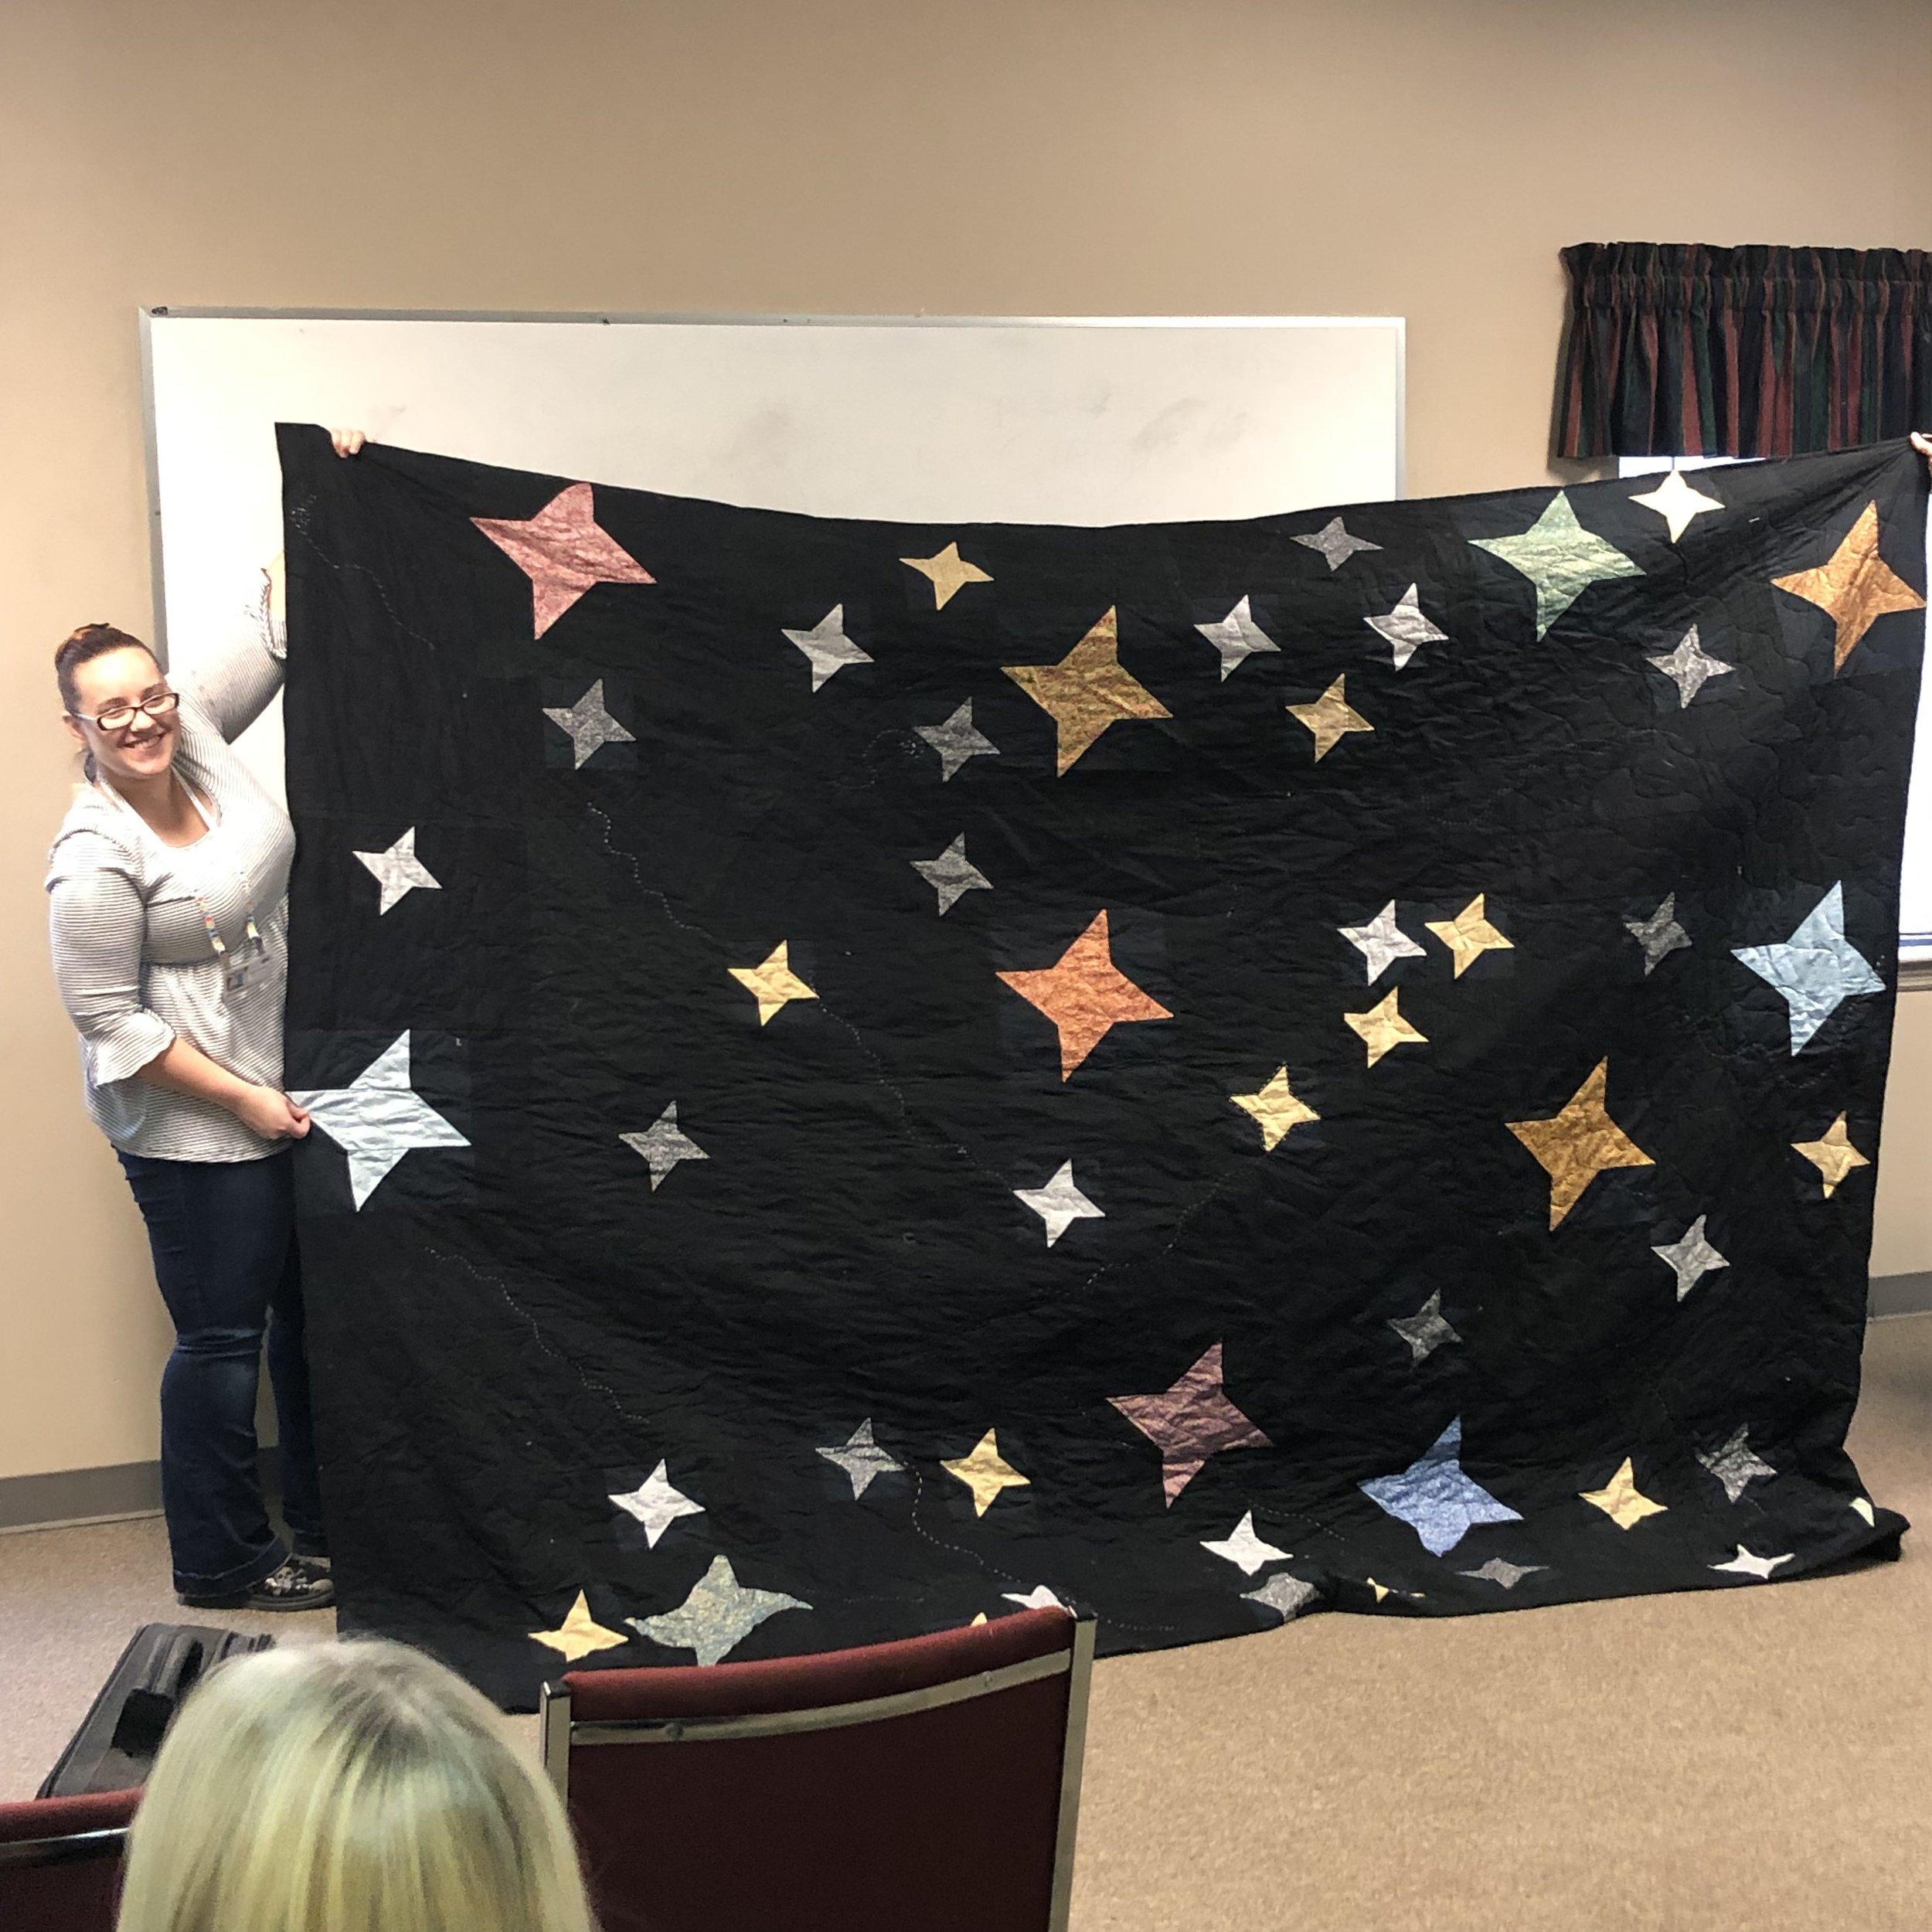 Stephanie's Star Quilt